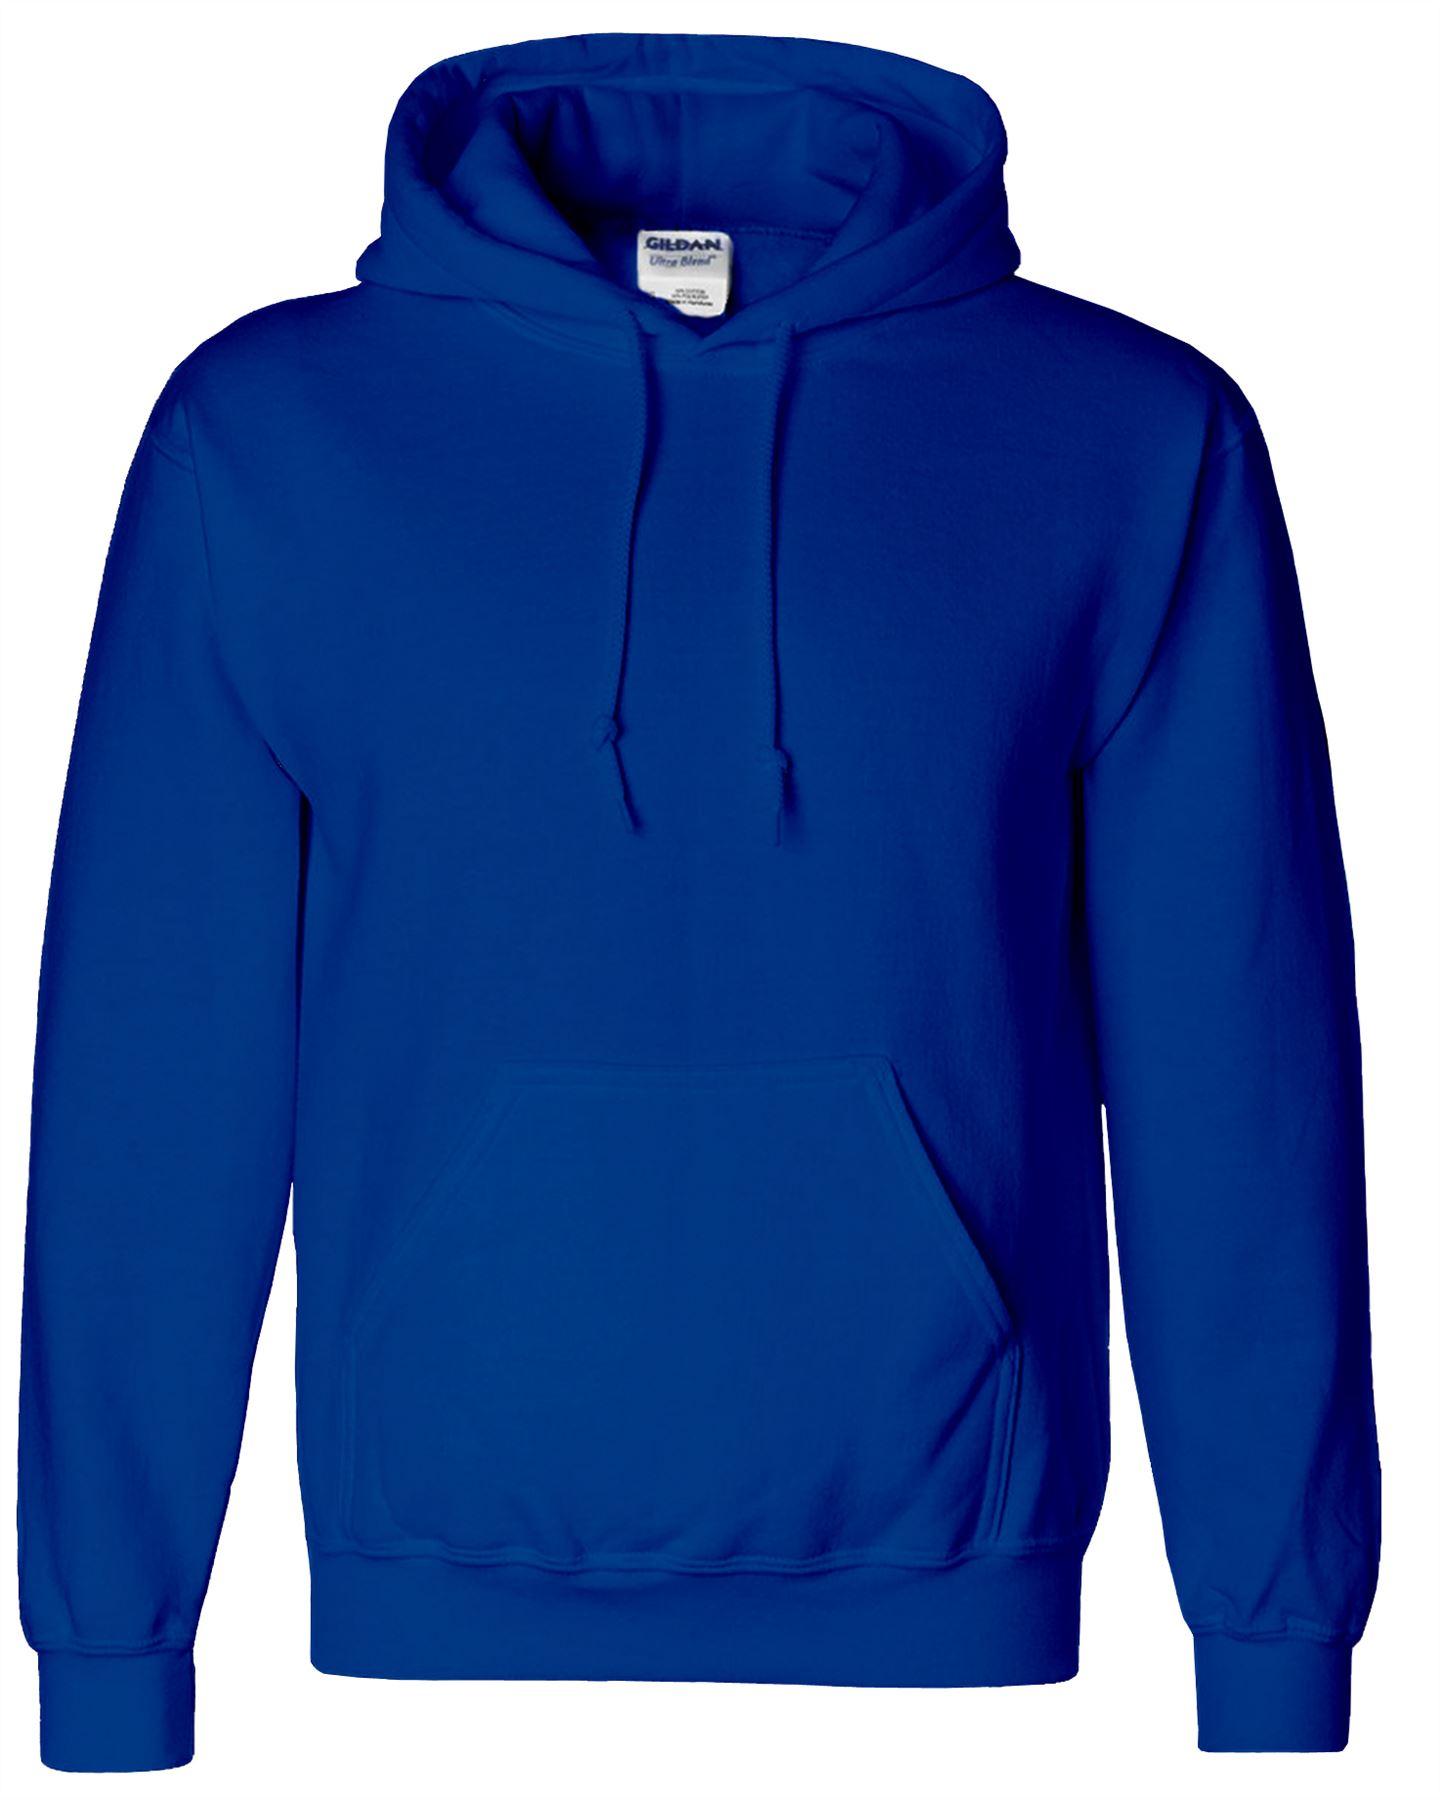 Hooded Sweatshirt-Faith Creative Names